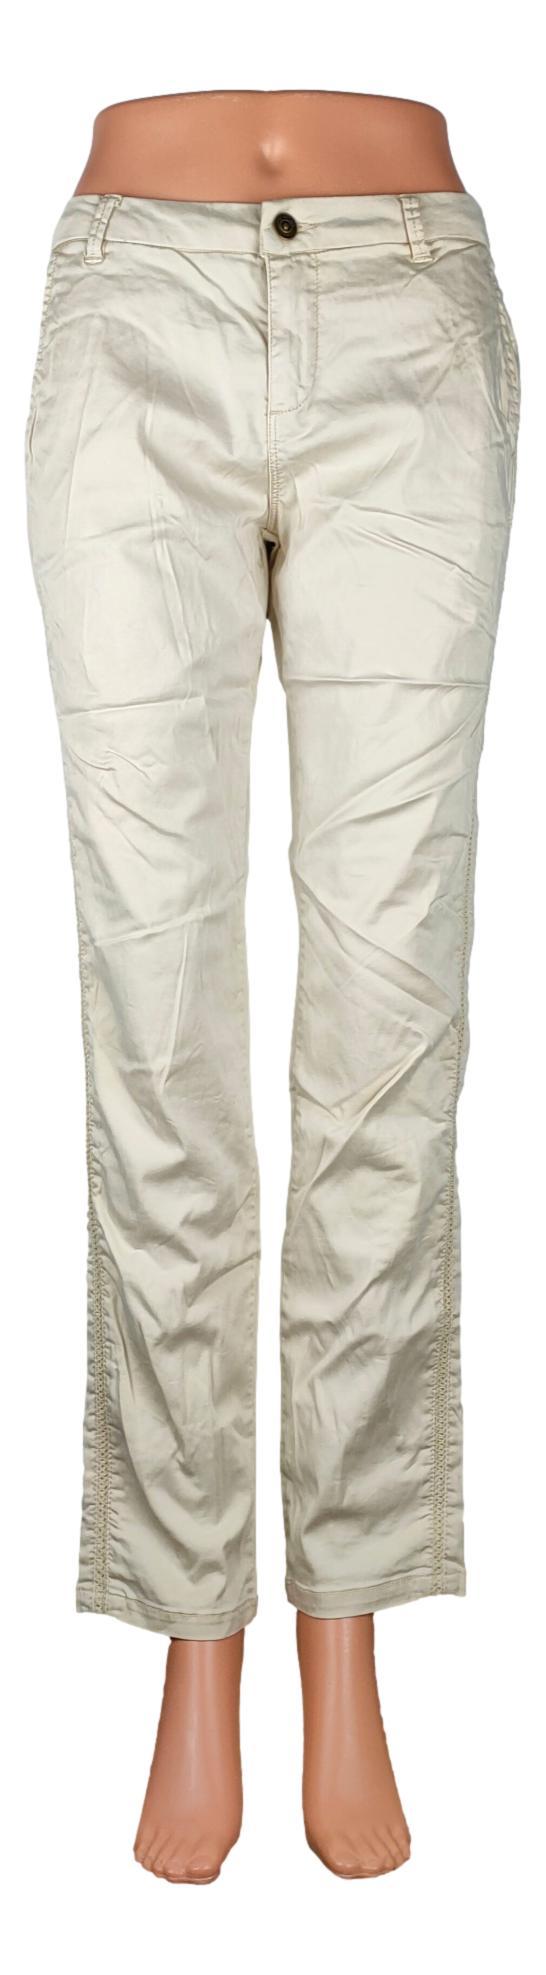 Pantalon Bonobo - Taille 36